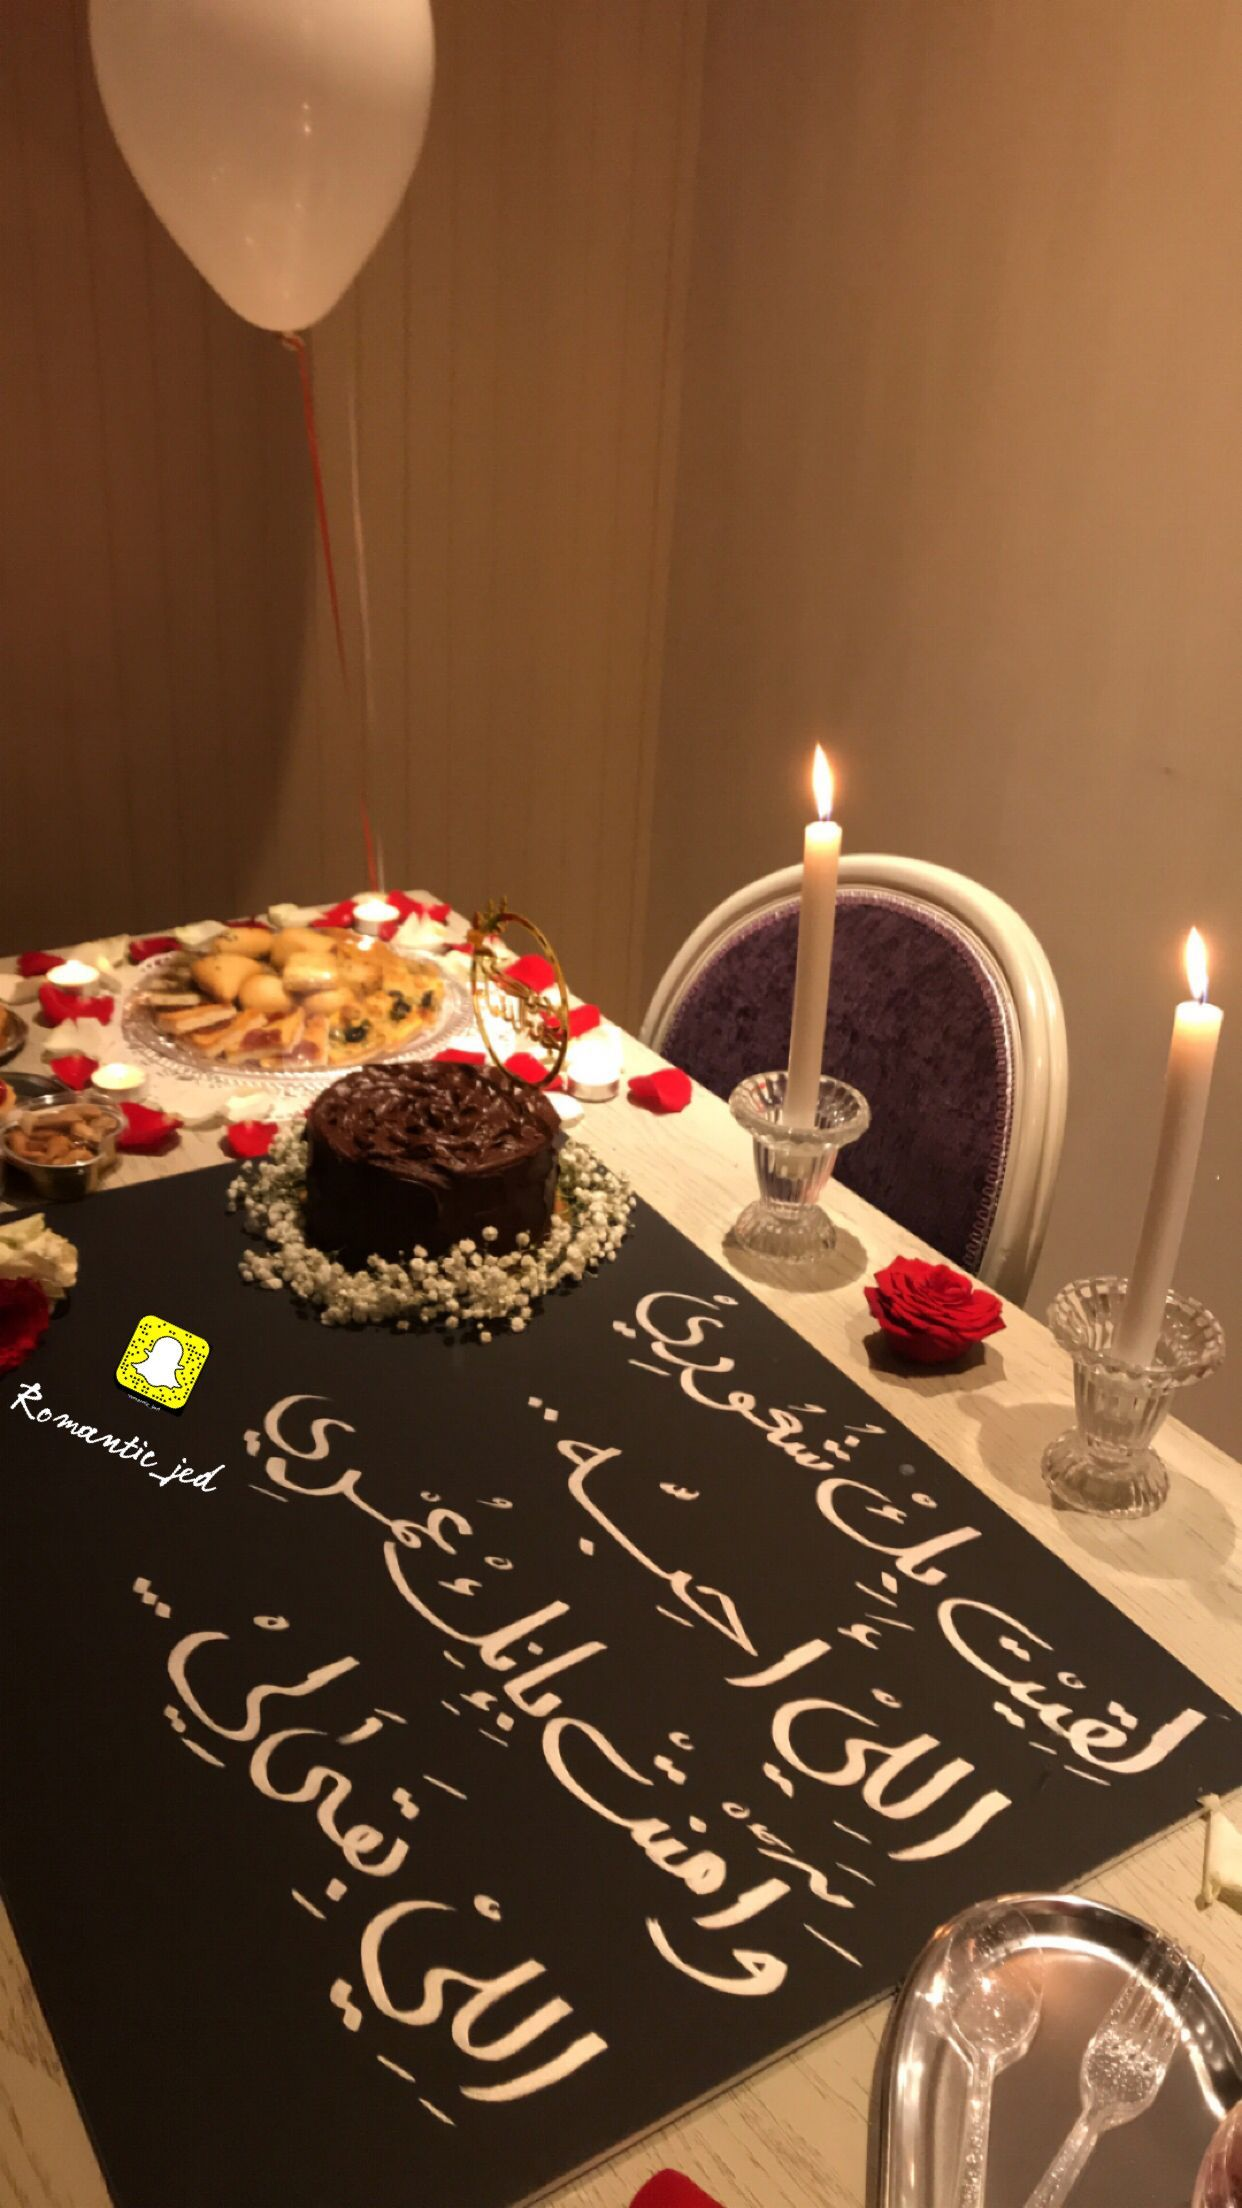 Notitle Romanticgiftsaesthetic Romanticgiftsanniversary Romanticgiftsflowe Homemade Romantic Gifts Romantic Dinner Decoration Birthday Surprise Party